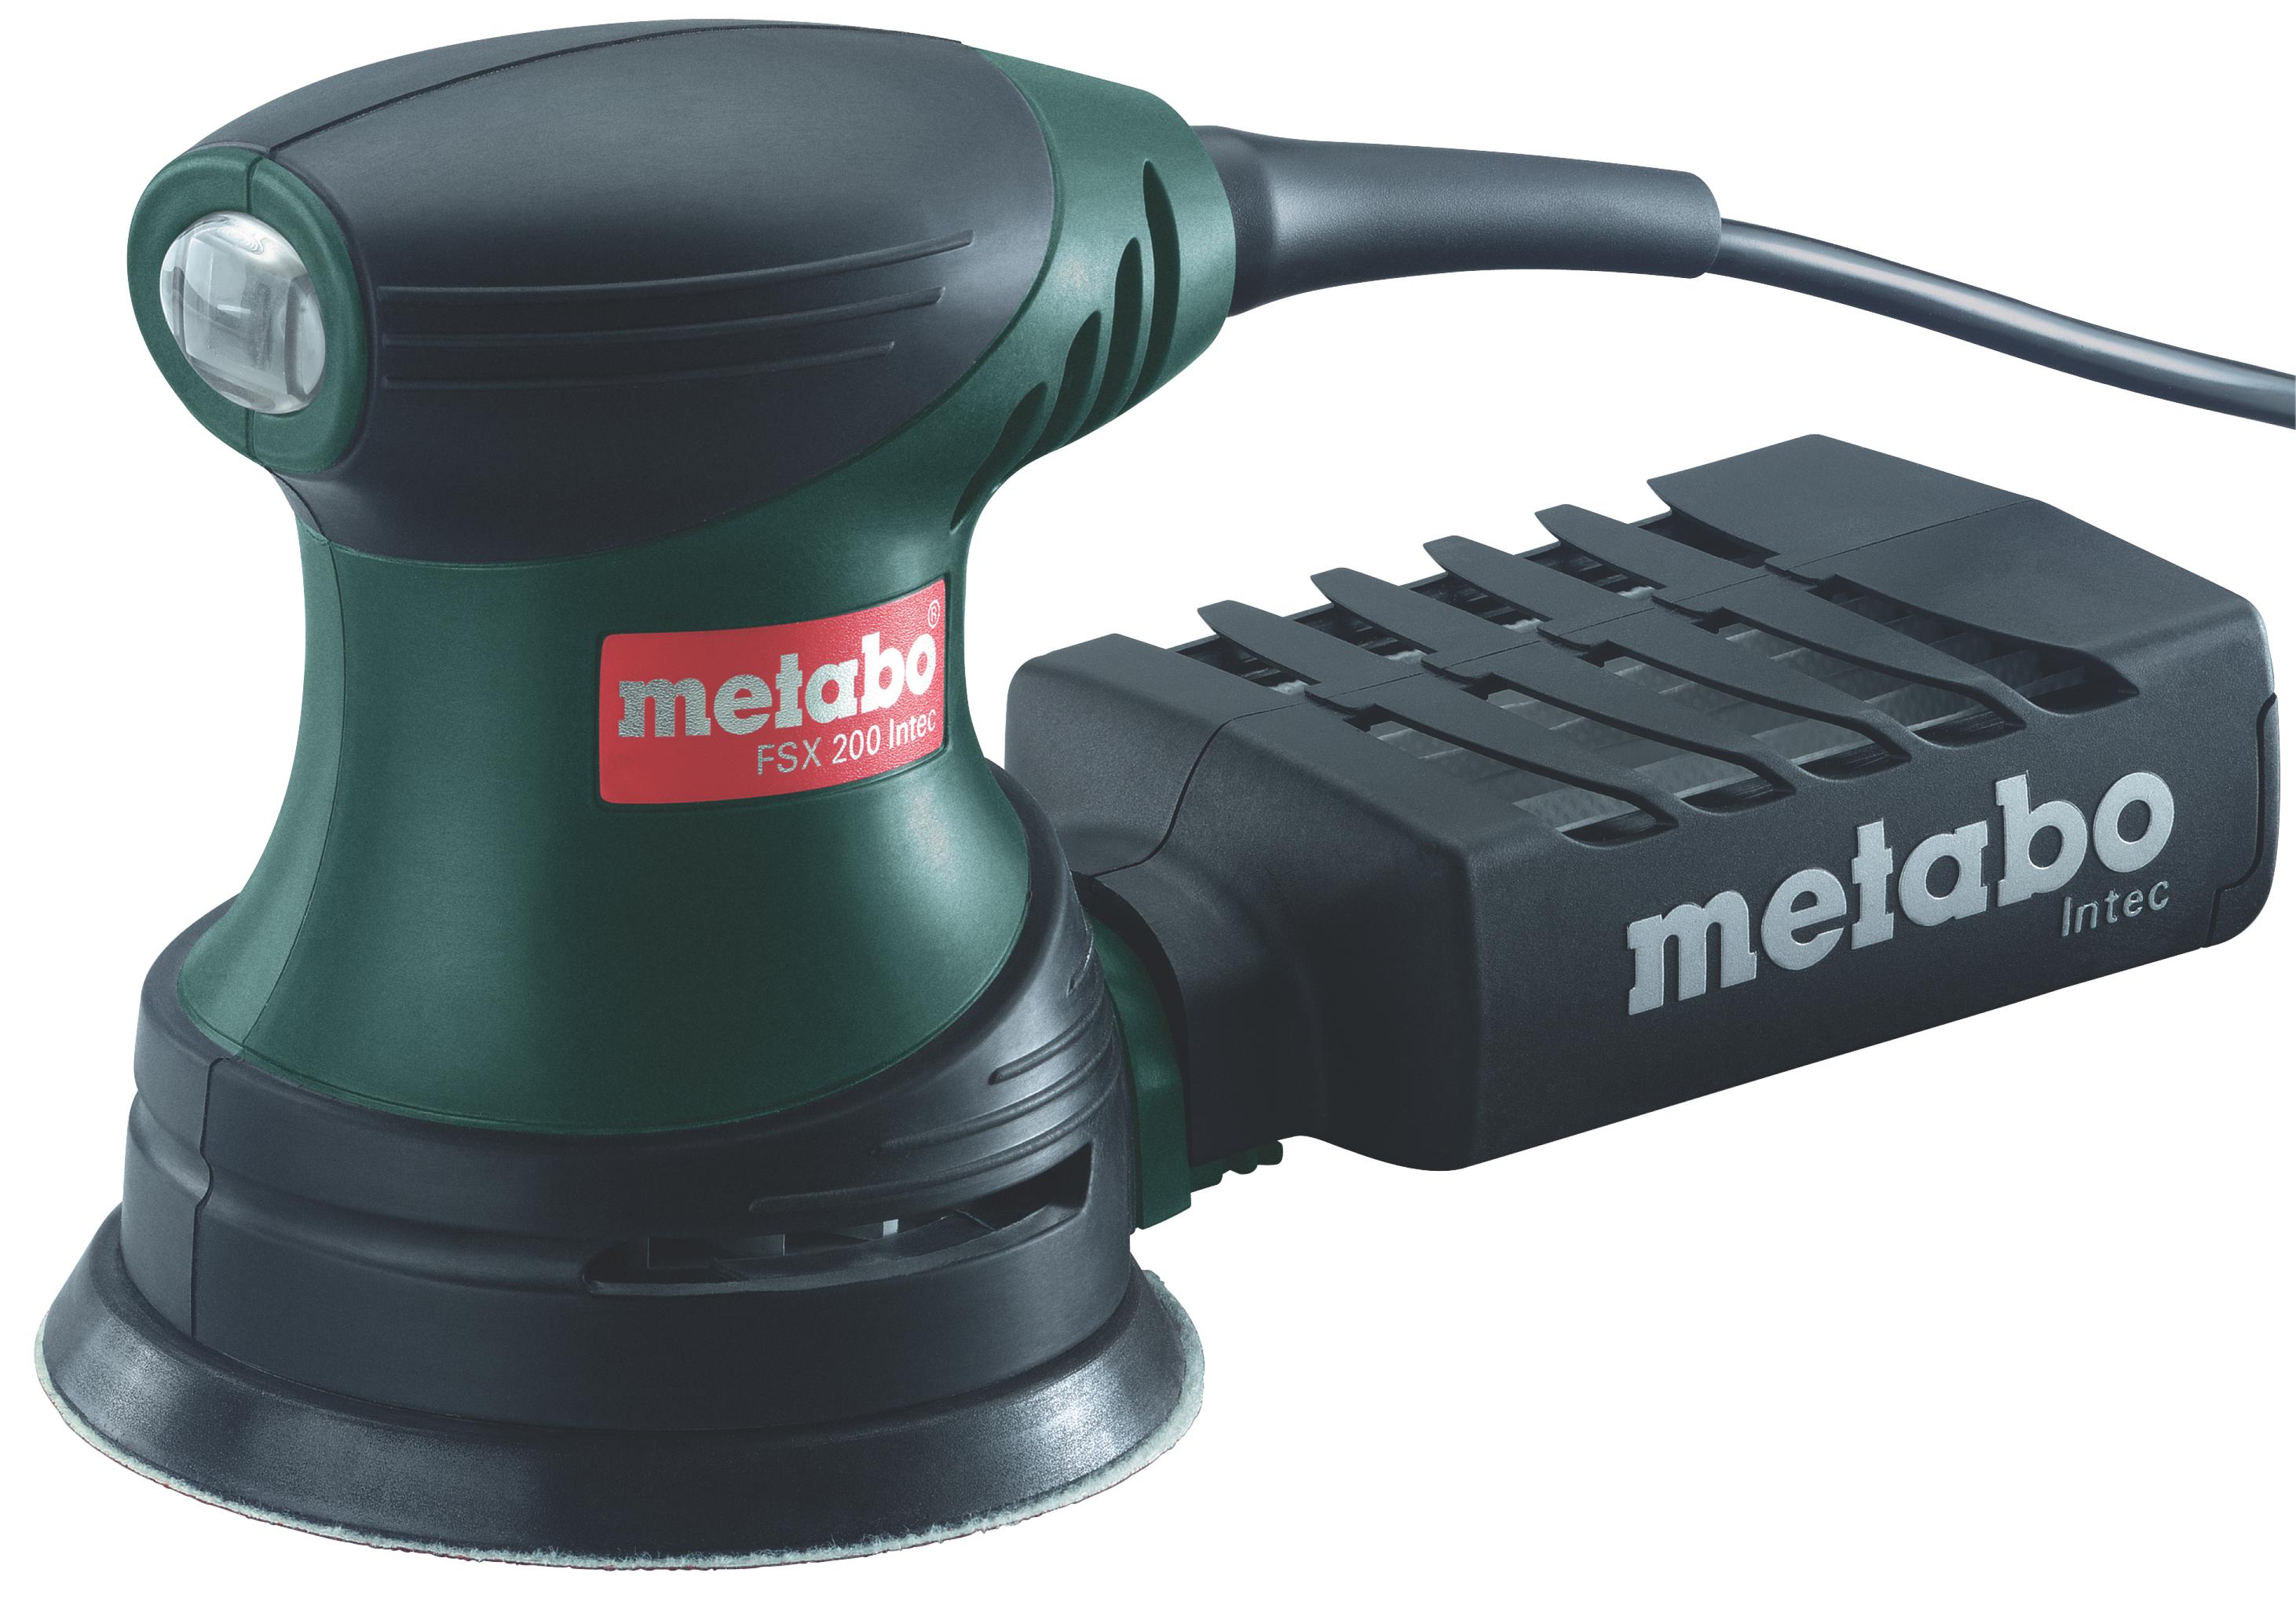 ������� ������������ ����������� (��������������) Metabo Fsx 200 intec